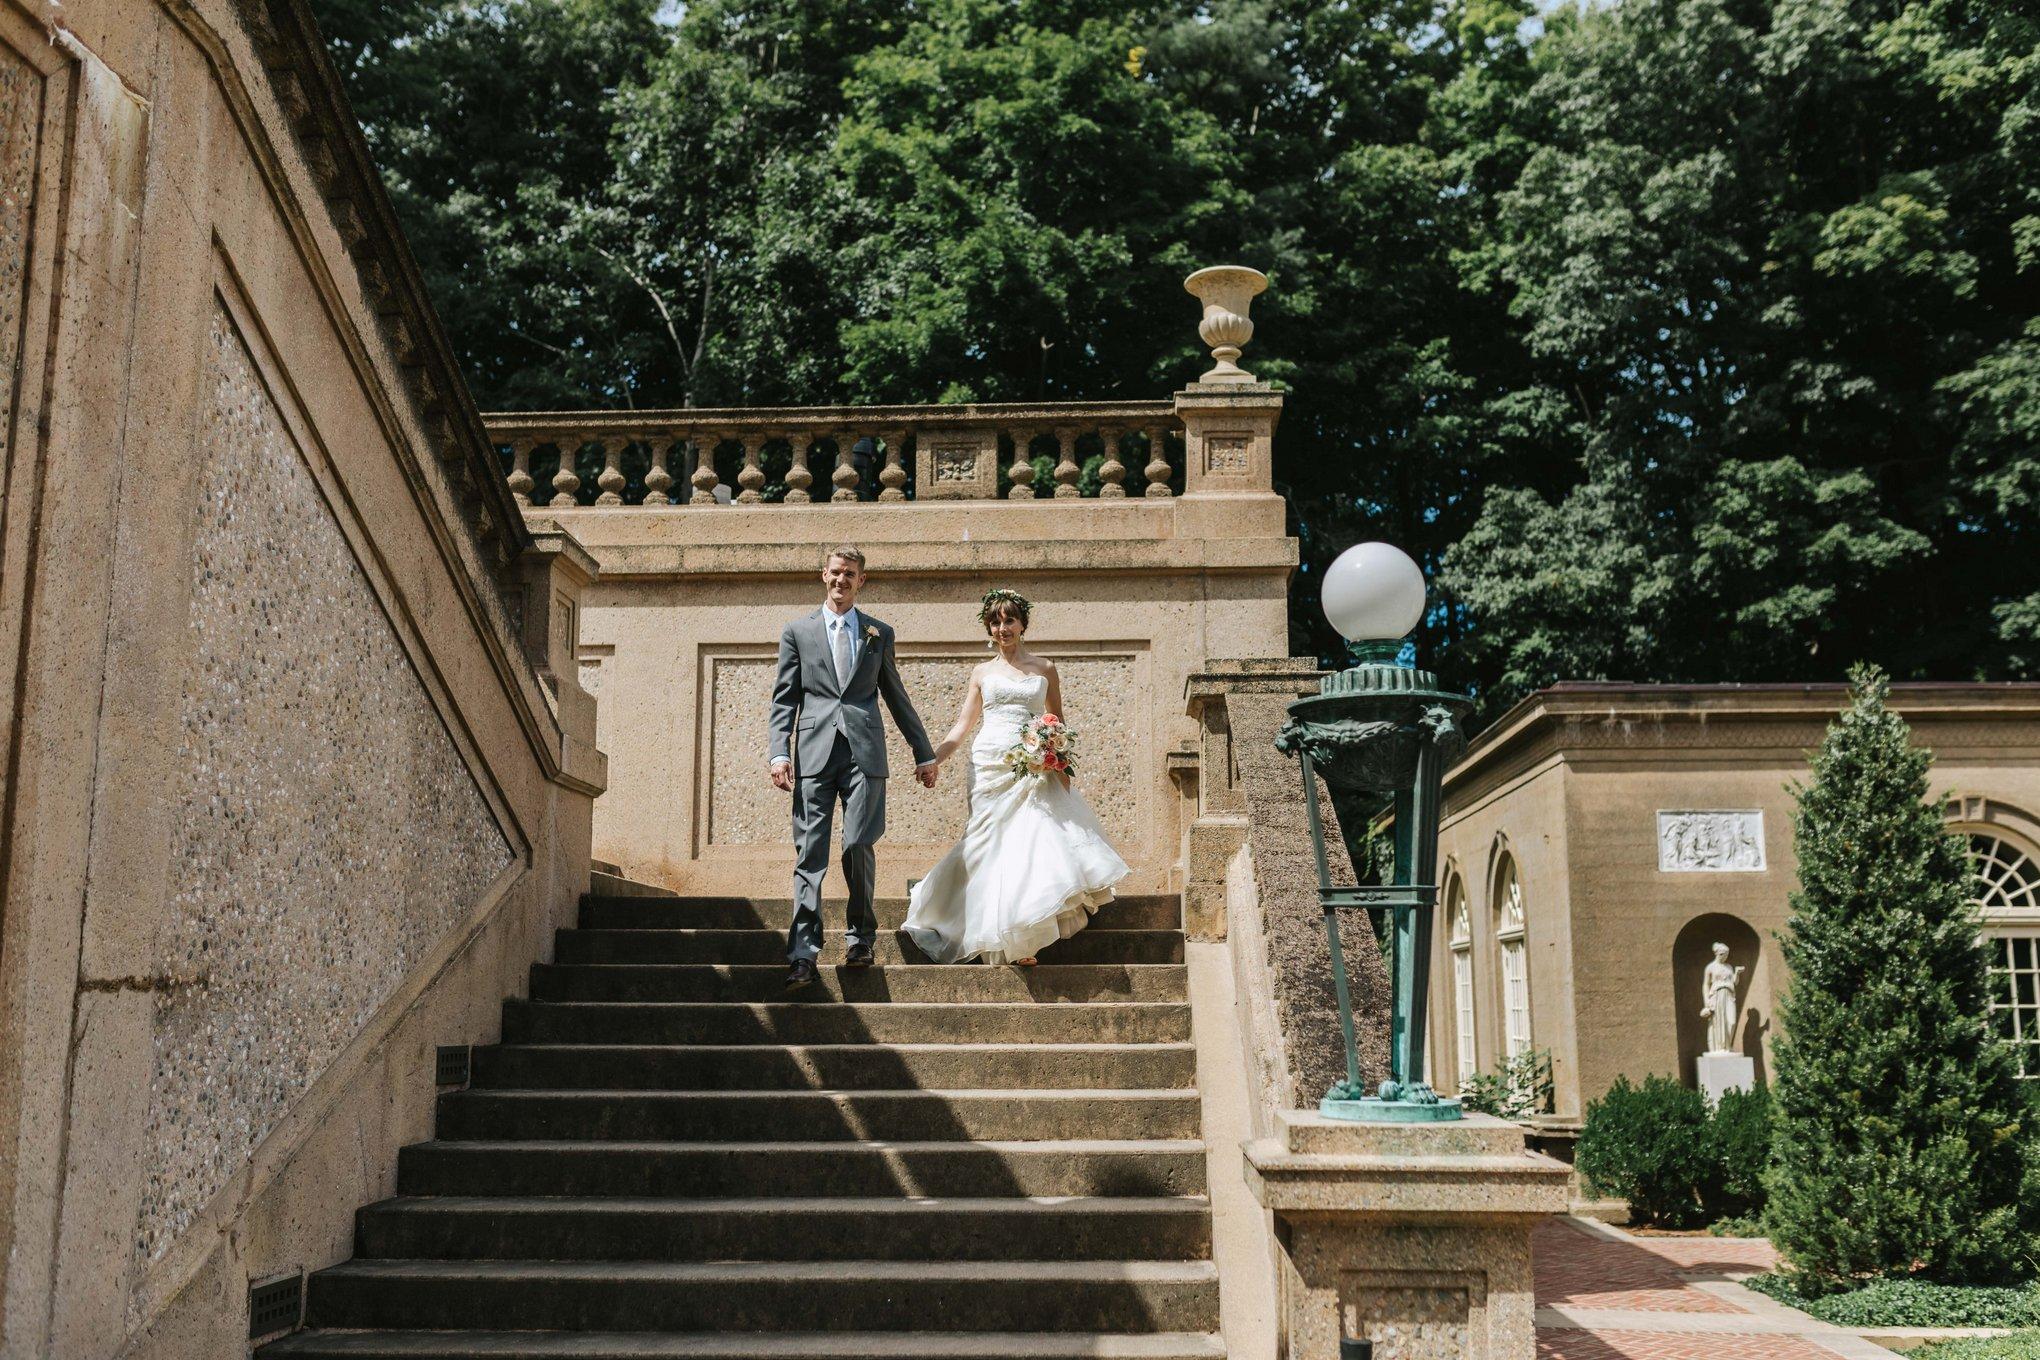 Crane-Estate-Vow-Renewal-Wedding-17.JPG